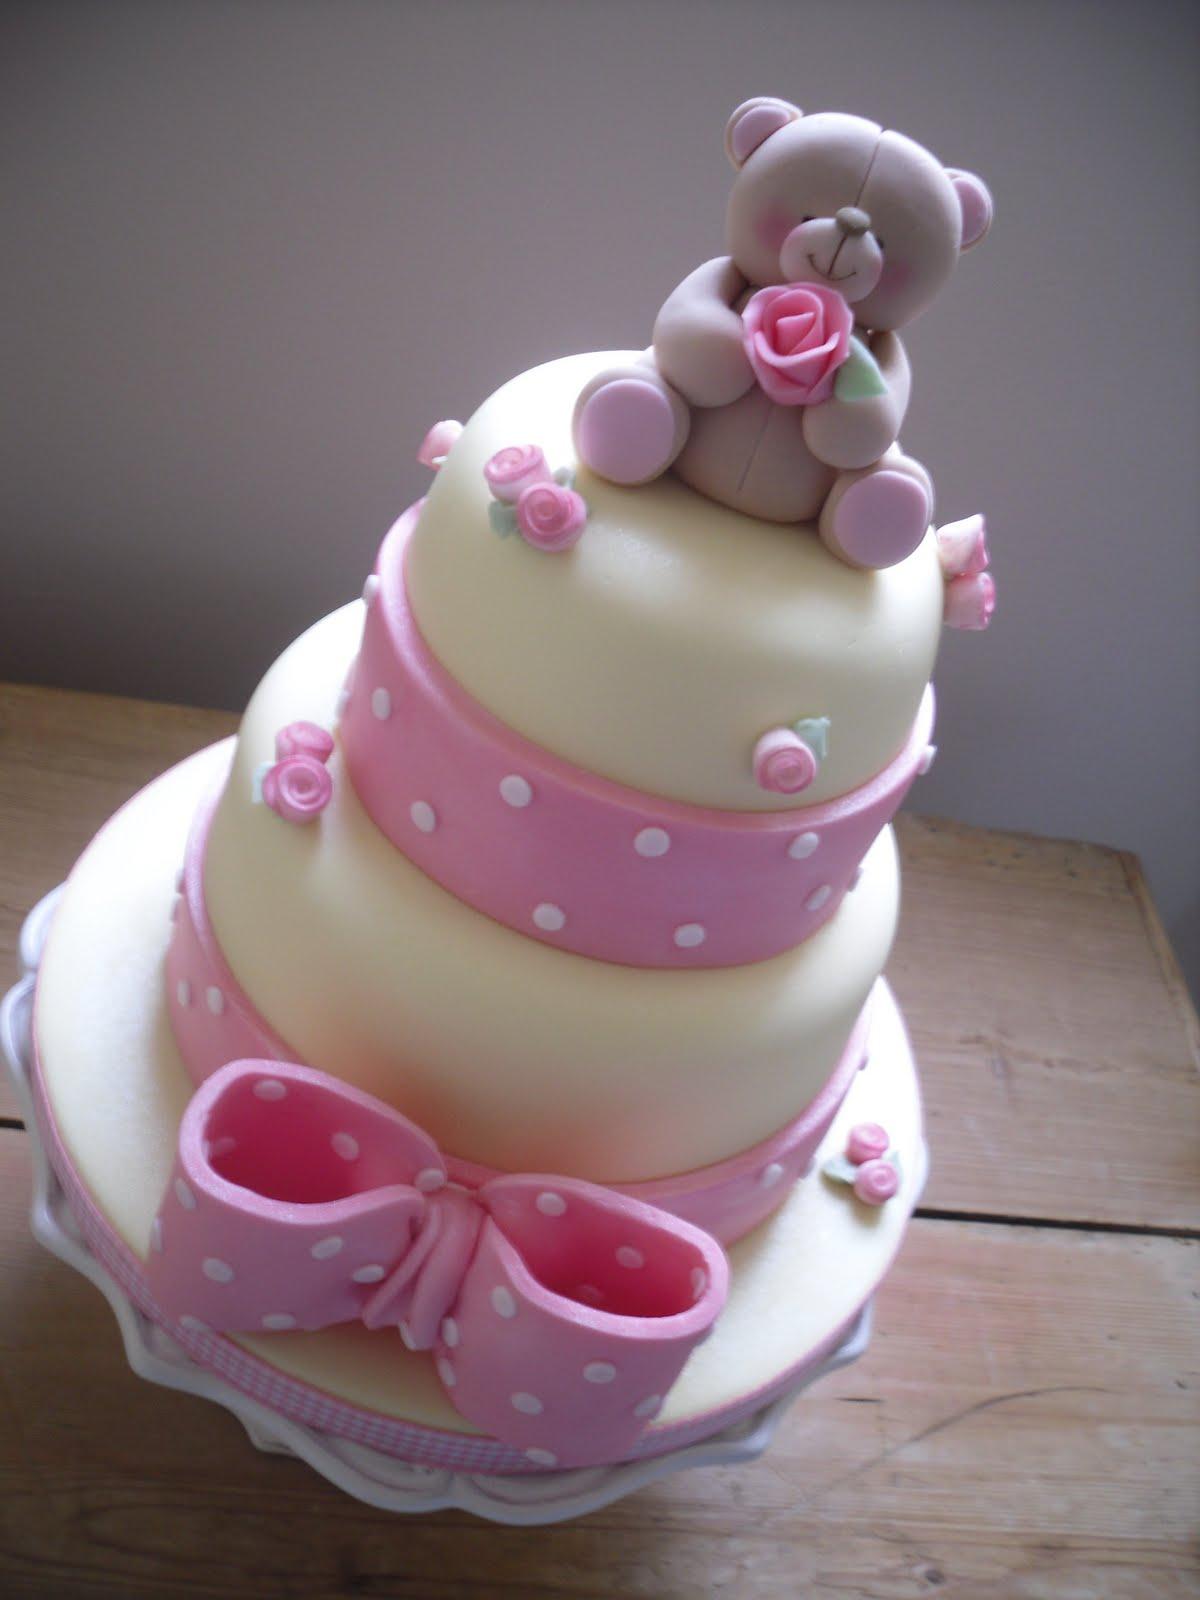 Katies Cupcakes: Forever Friends Birthday Cake